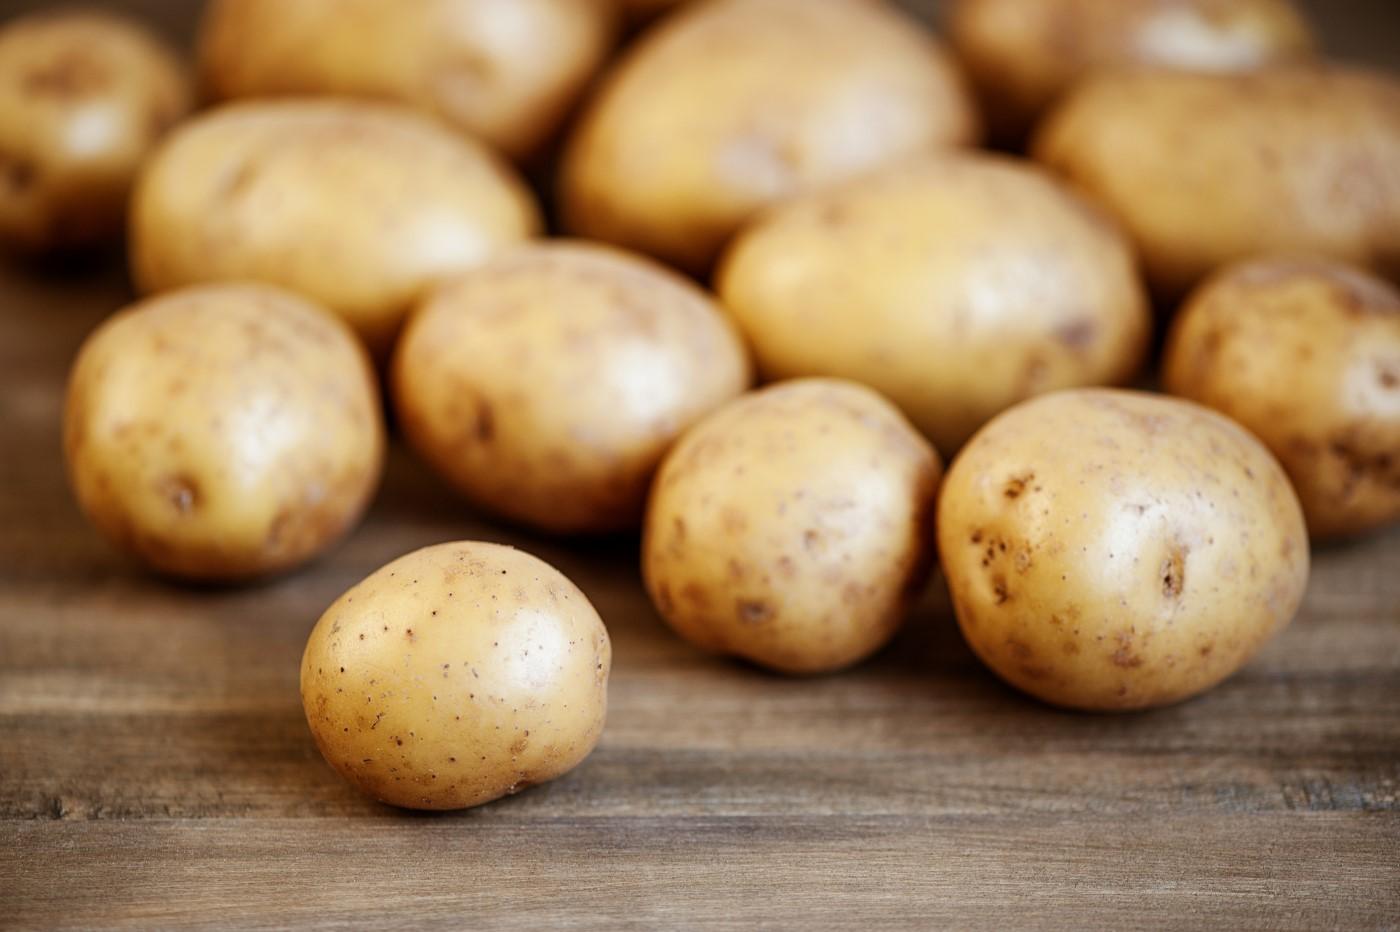 potato-committee.jpeg